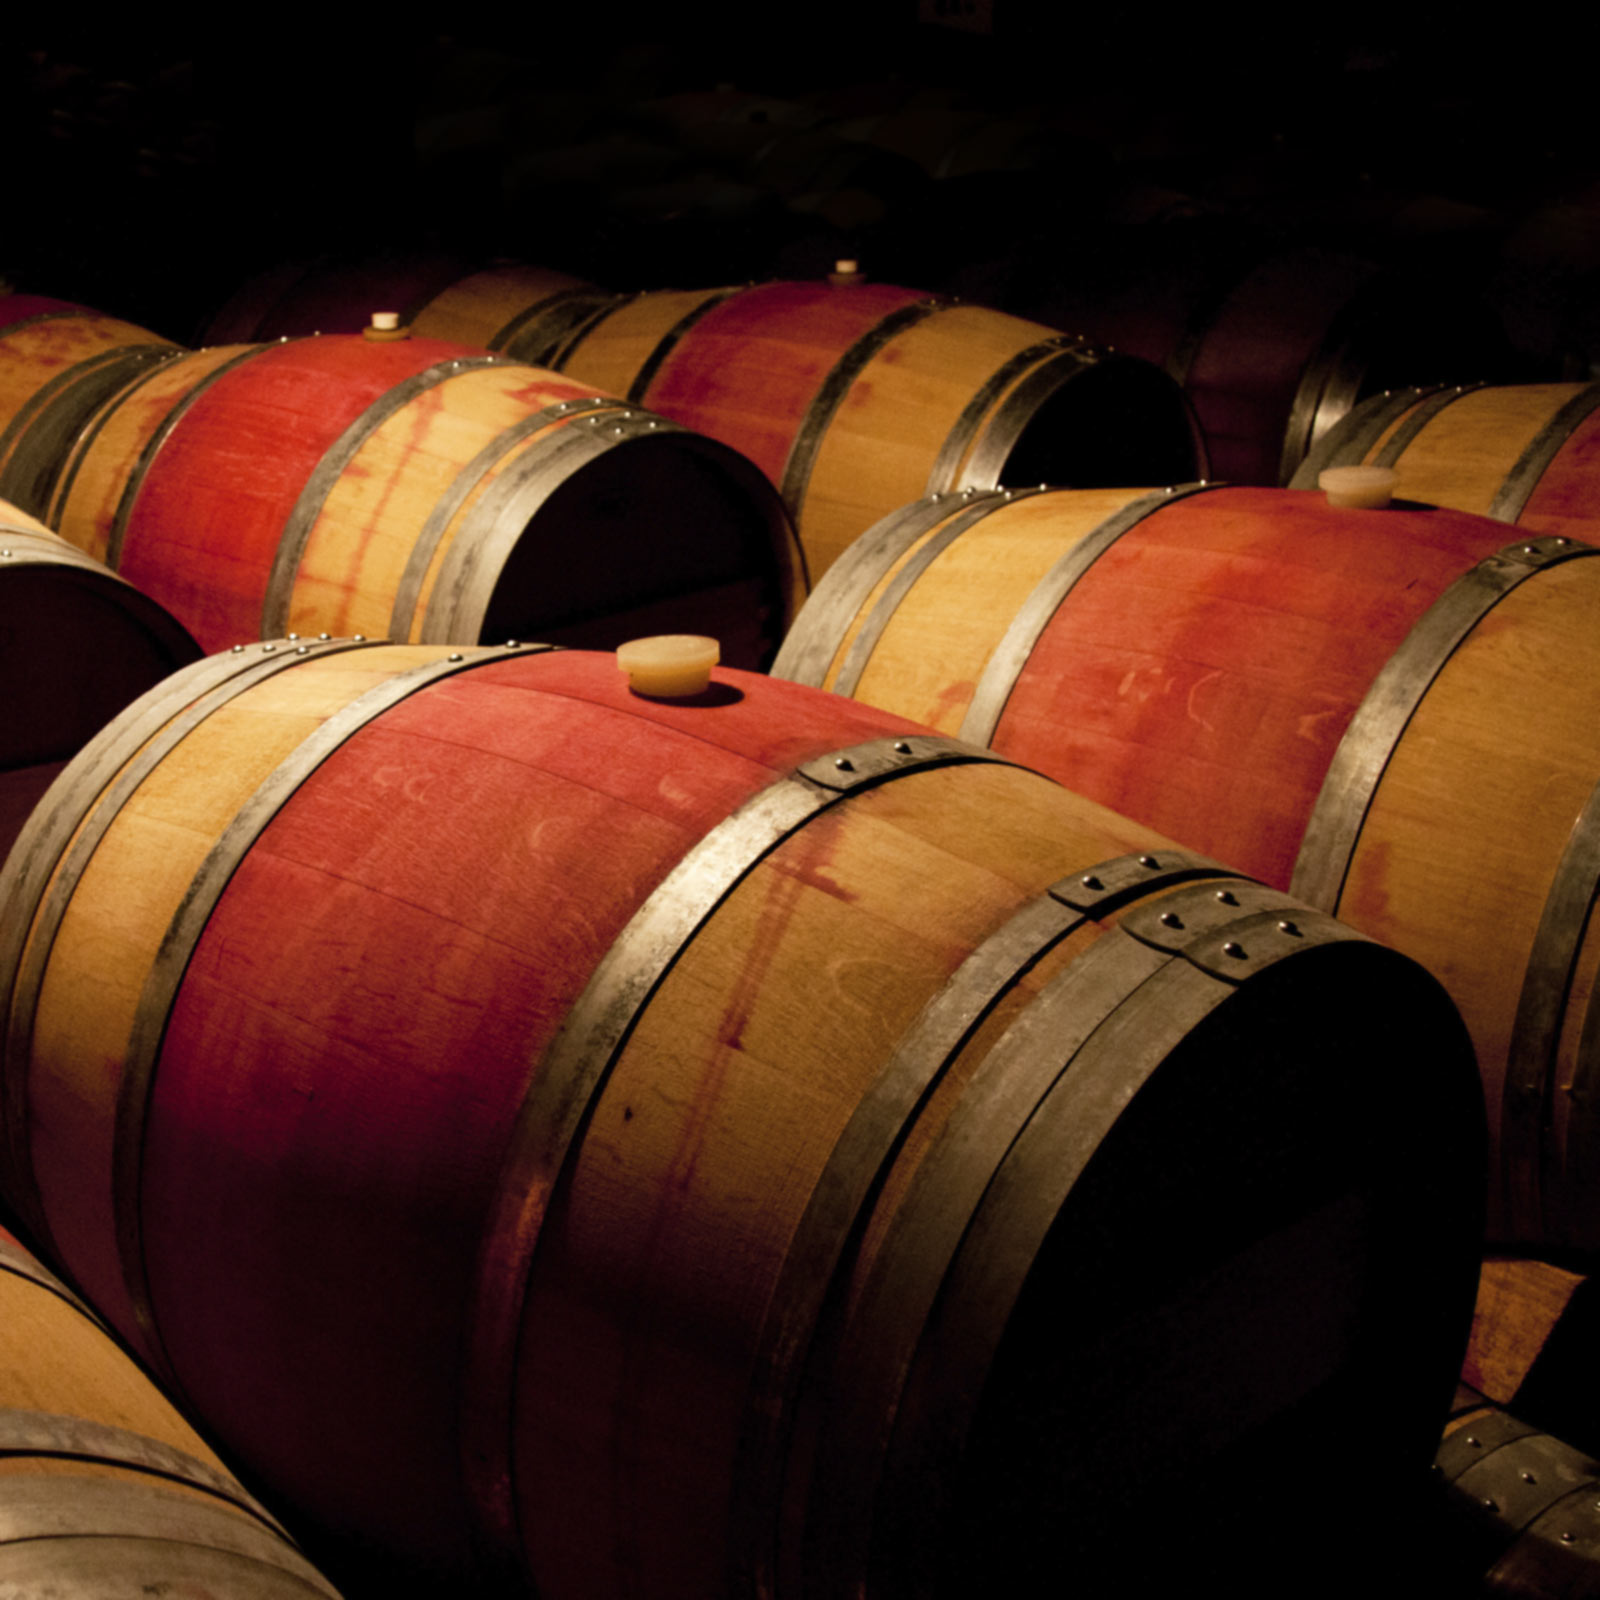 Overlooking wine barrels in a small barrel room or cellar